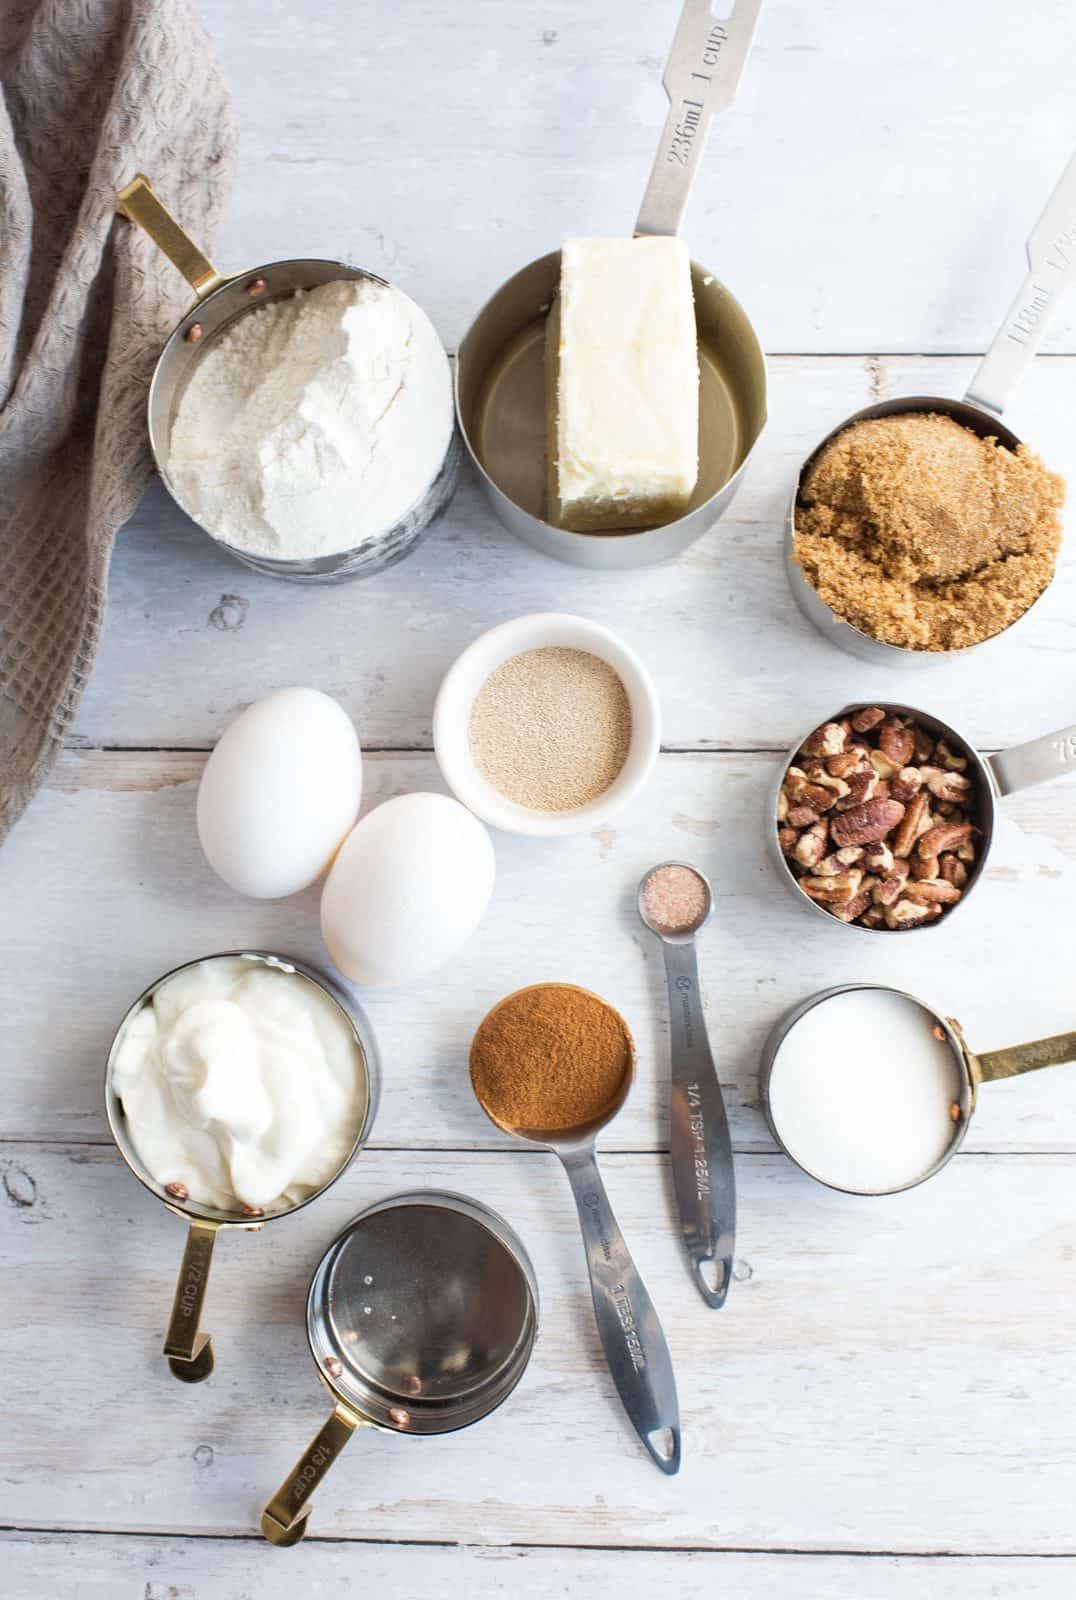 Ingredients needed: instant yeast, water, granulated sugar, sour cream, all-purpose flour, salt, butter, eggs, brown sugar, pecans and cinnamon.